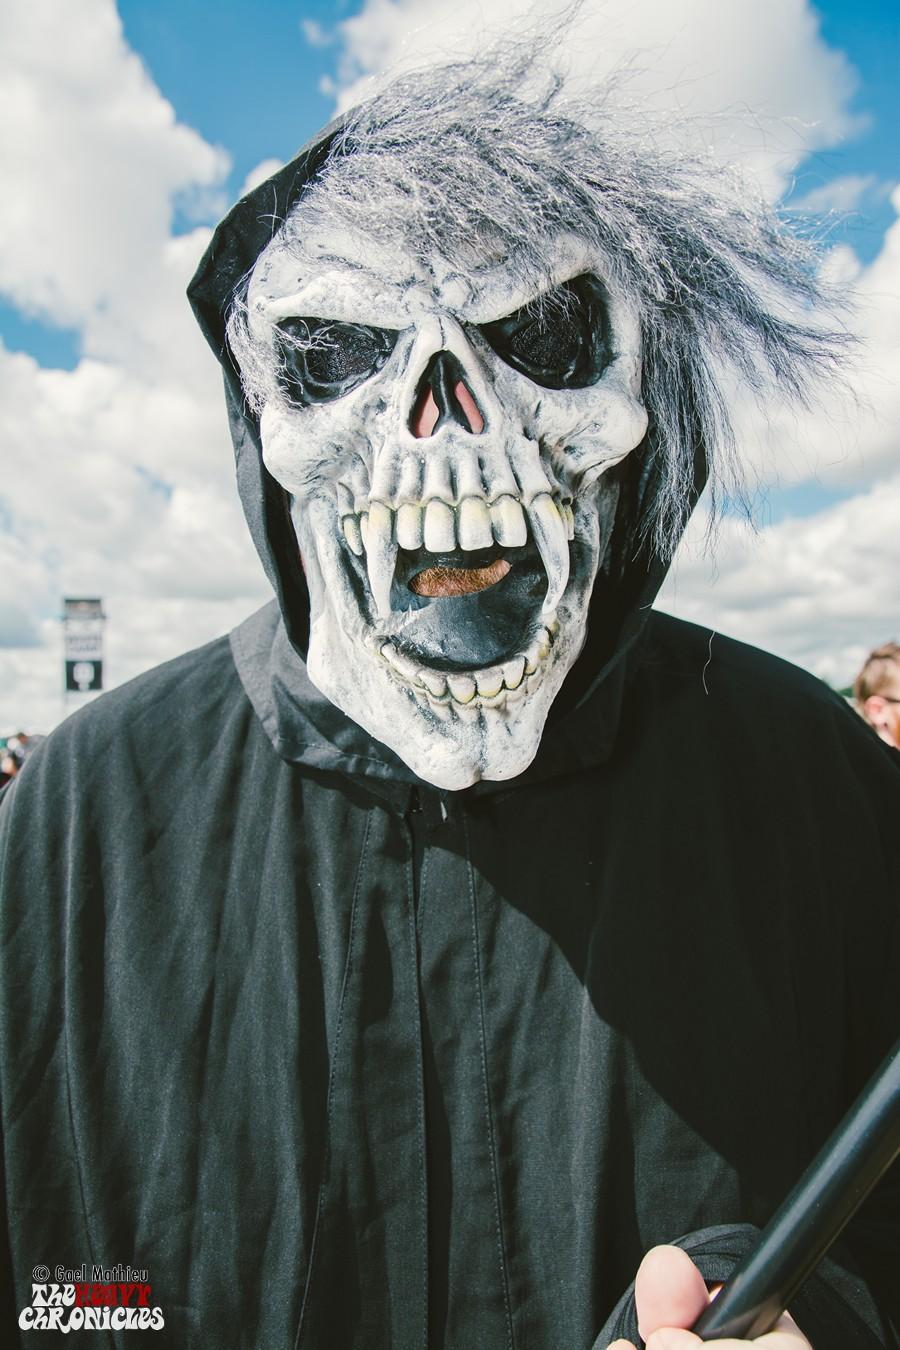 J-ambiance-hellfest-2013-clisson-5